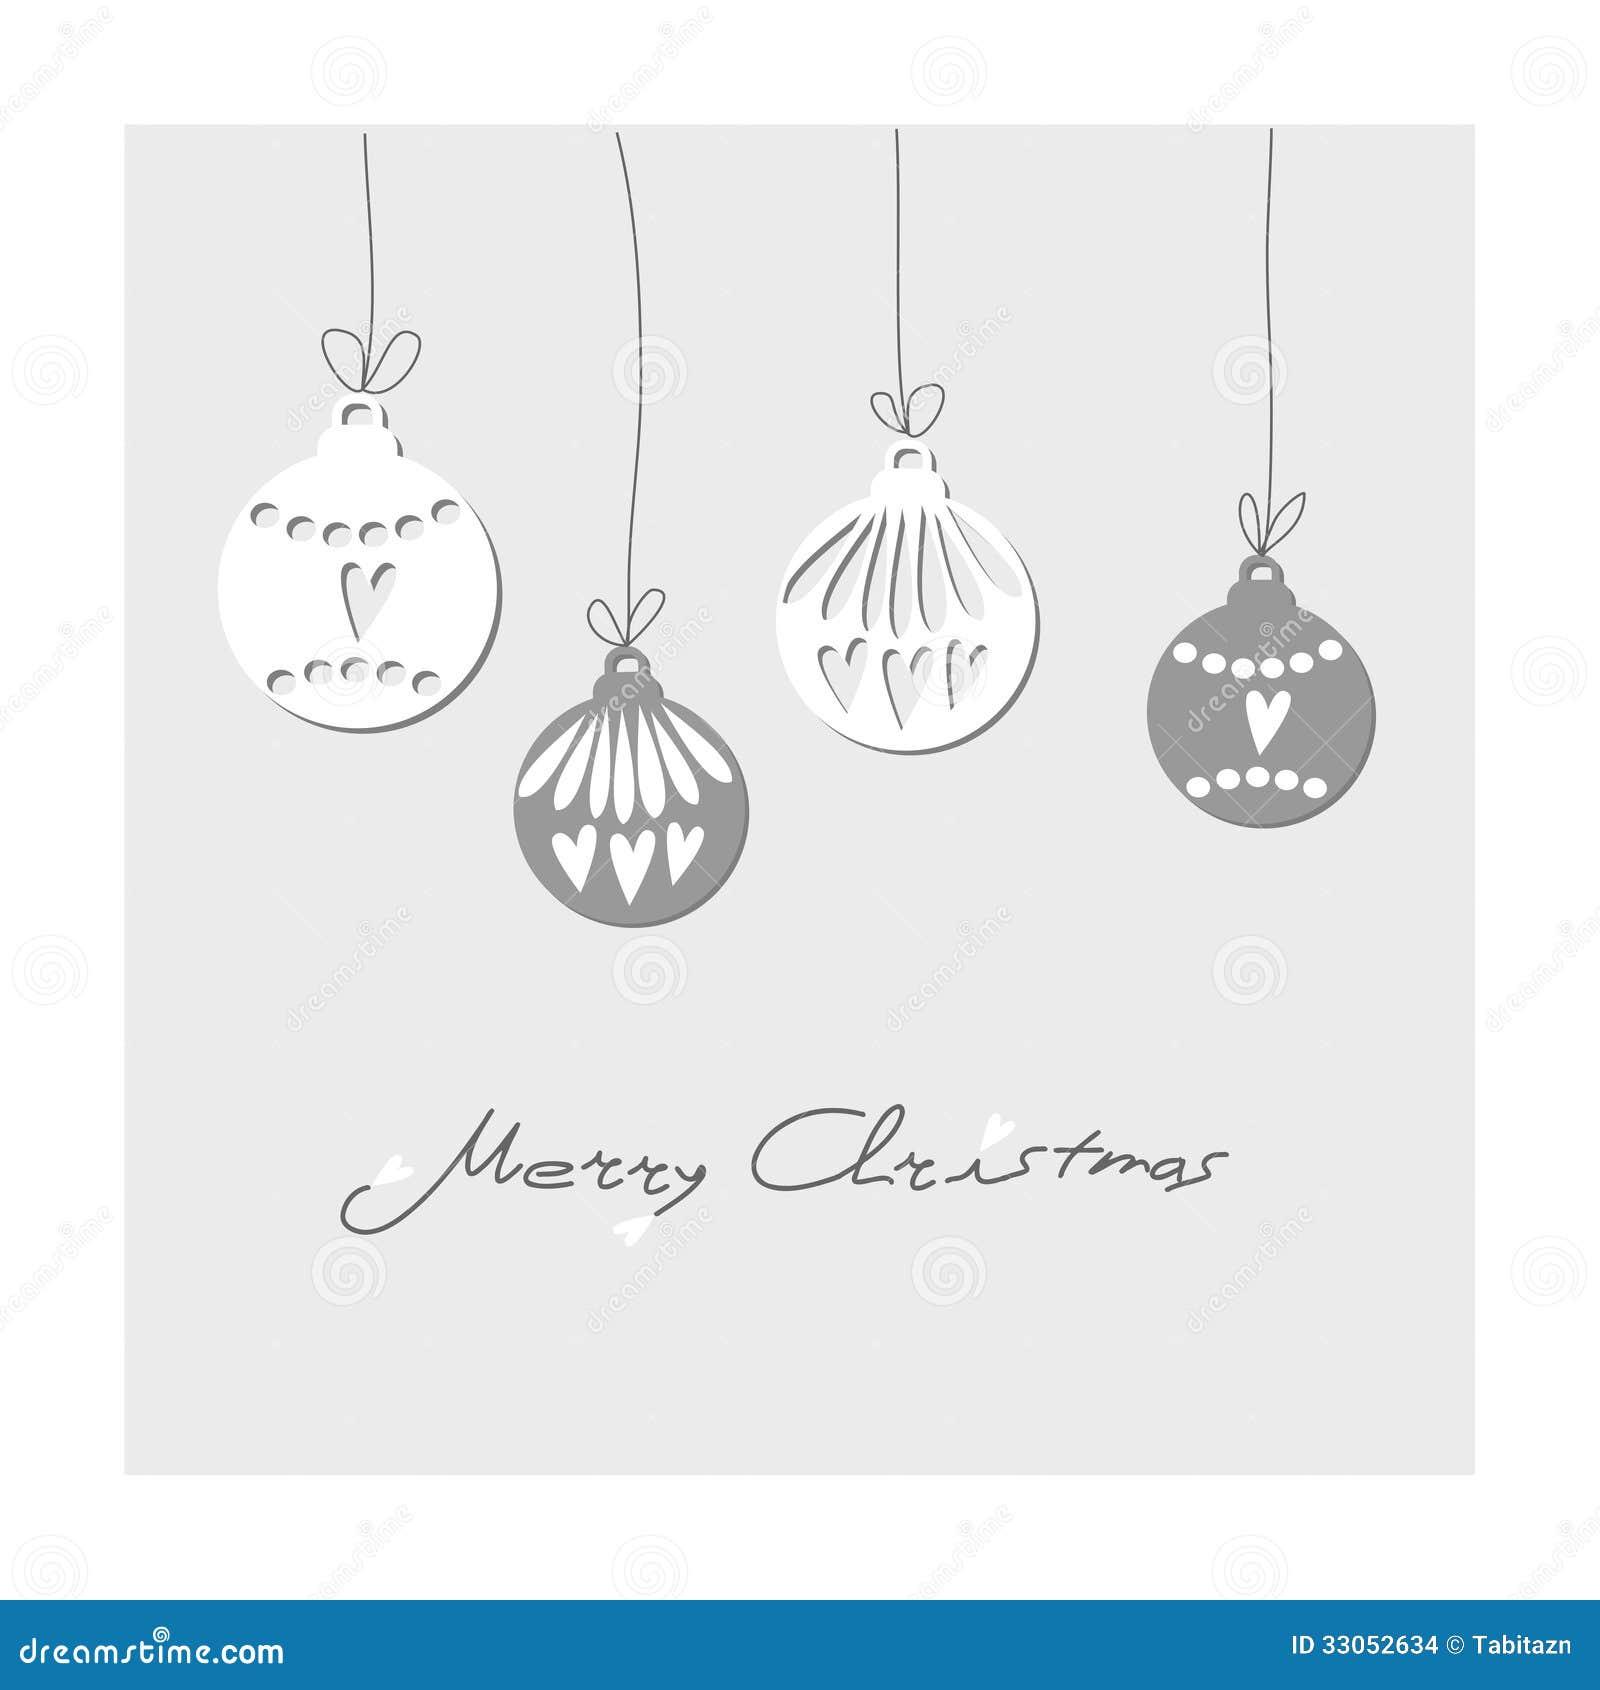 Christmas Vintage Card With Christmas Balls. Illu Stock Images ...